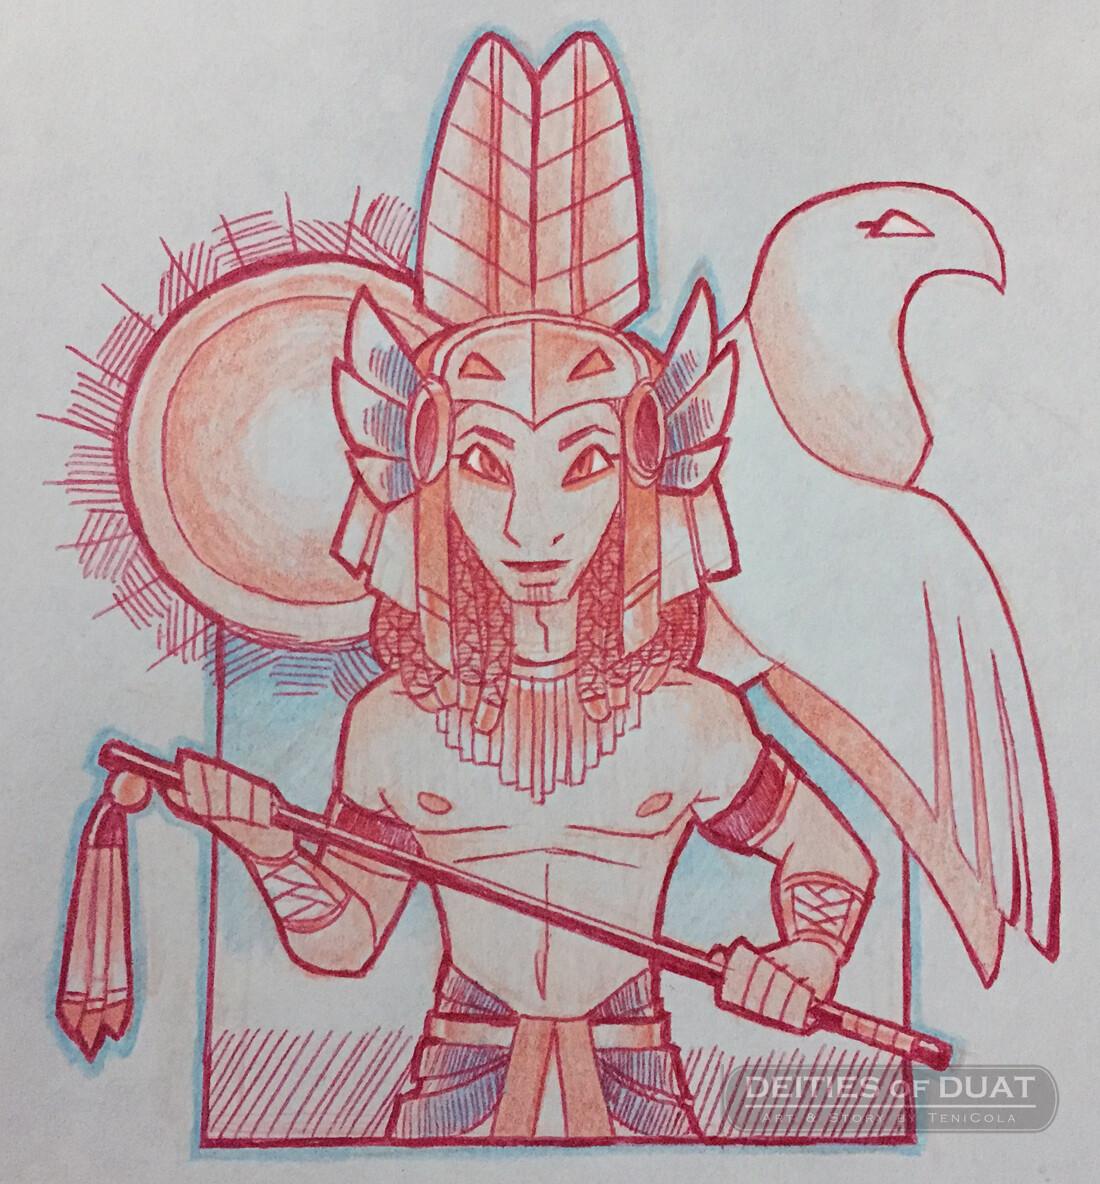 MONTU -- The God of Warfare and victory.